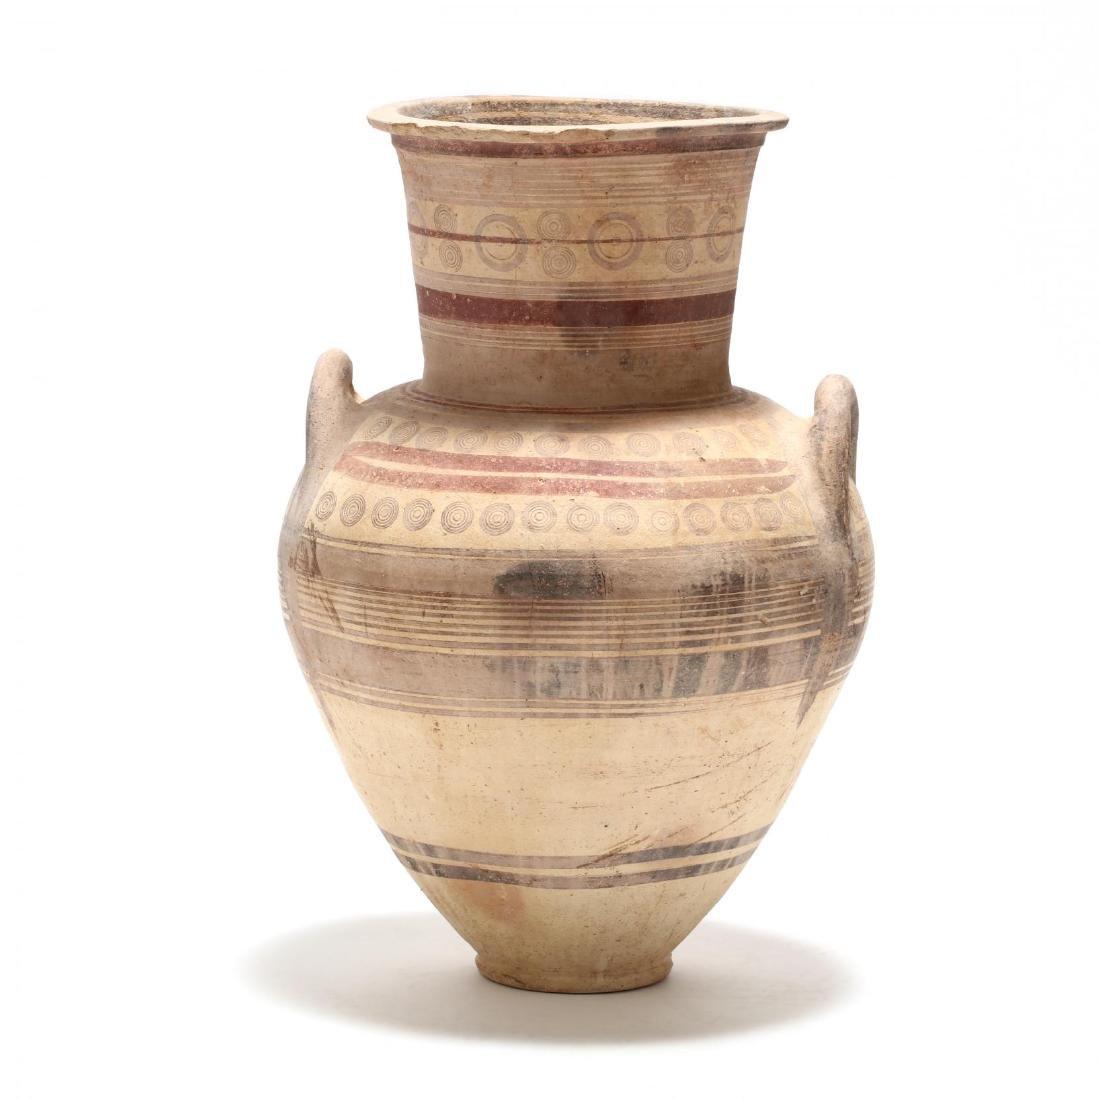 Large Cypro-Archaic Bichrome Amphora